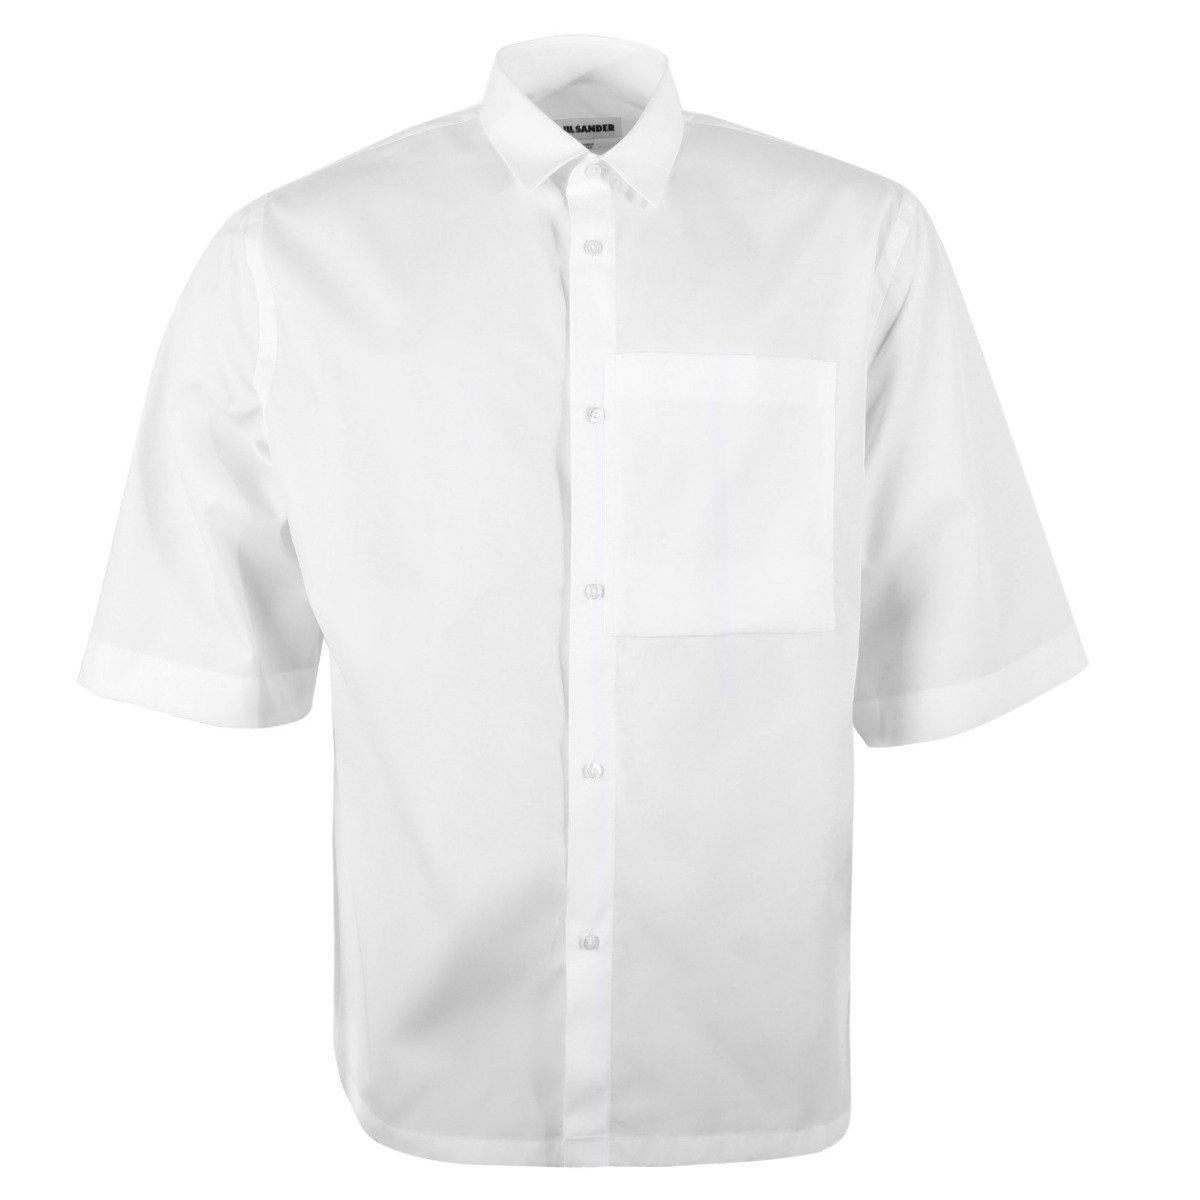 705bbf65d72603 Lyst - Jil Sander Jsuo742226 Mo244300 Silence Ff S/s Shirt in White